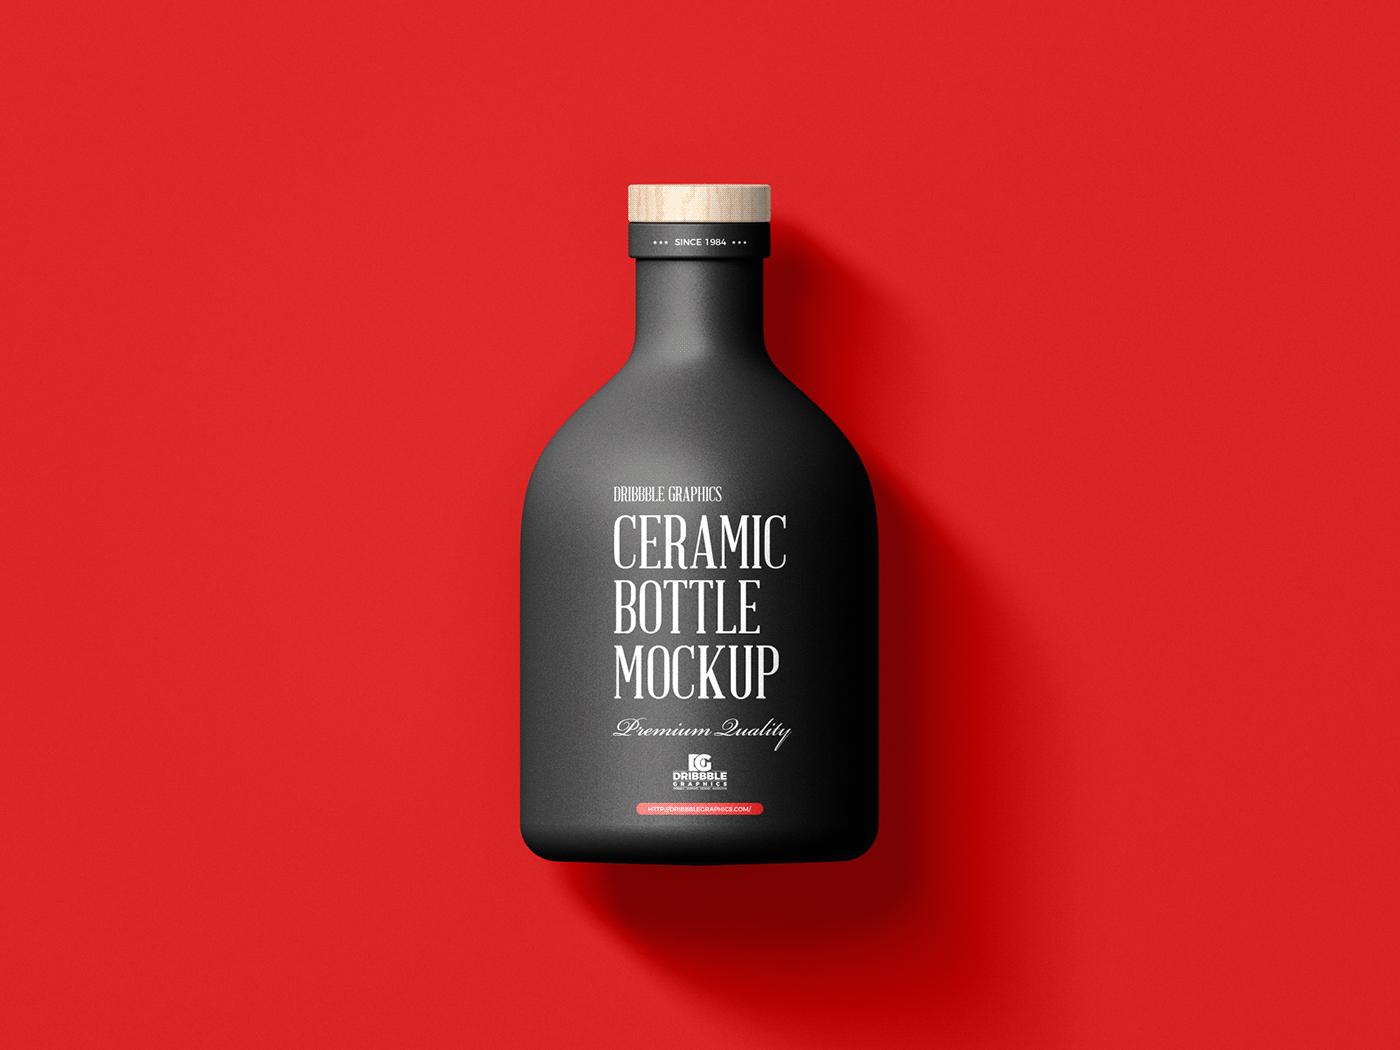 bottle mockup Ceramic bottle mockup free mockup  freebies Mockup mockup free mockup psd mockups packaging mockup psd